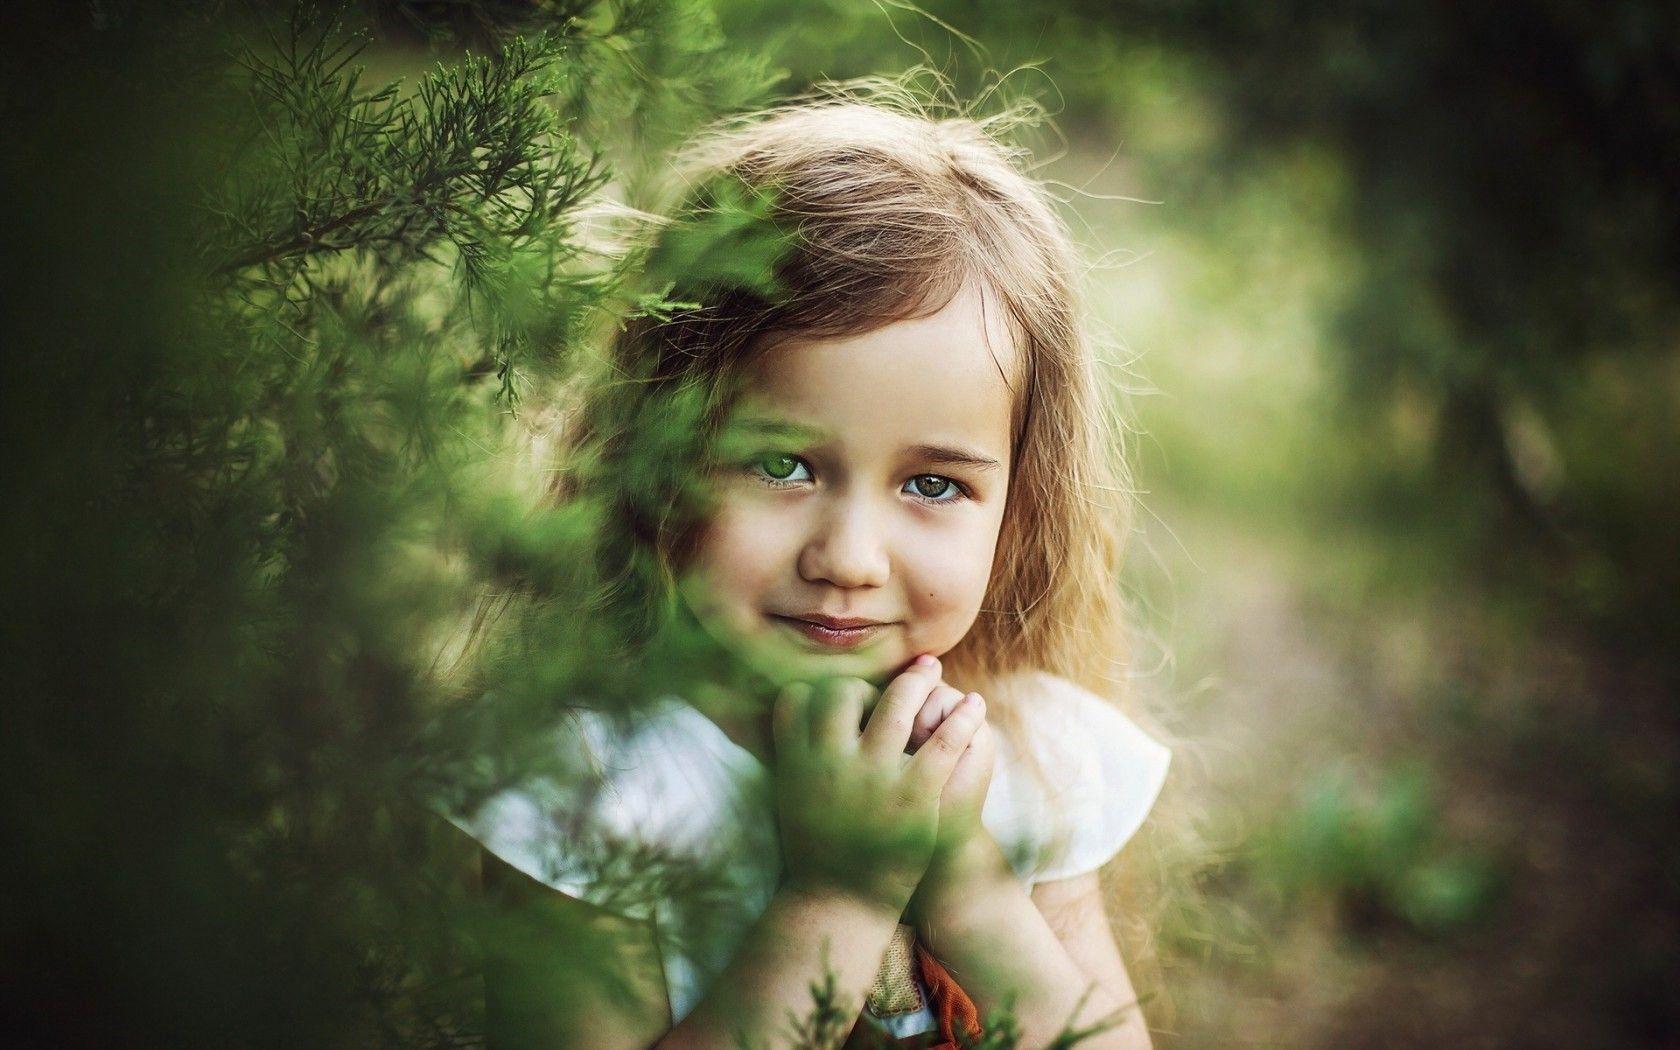 Beautiful Cute Baby Girls Wallpapers Wide